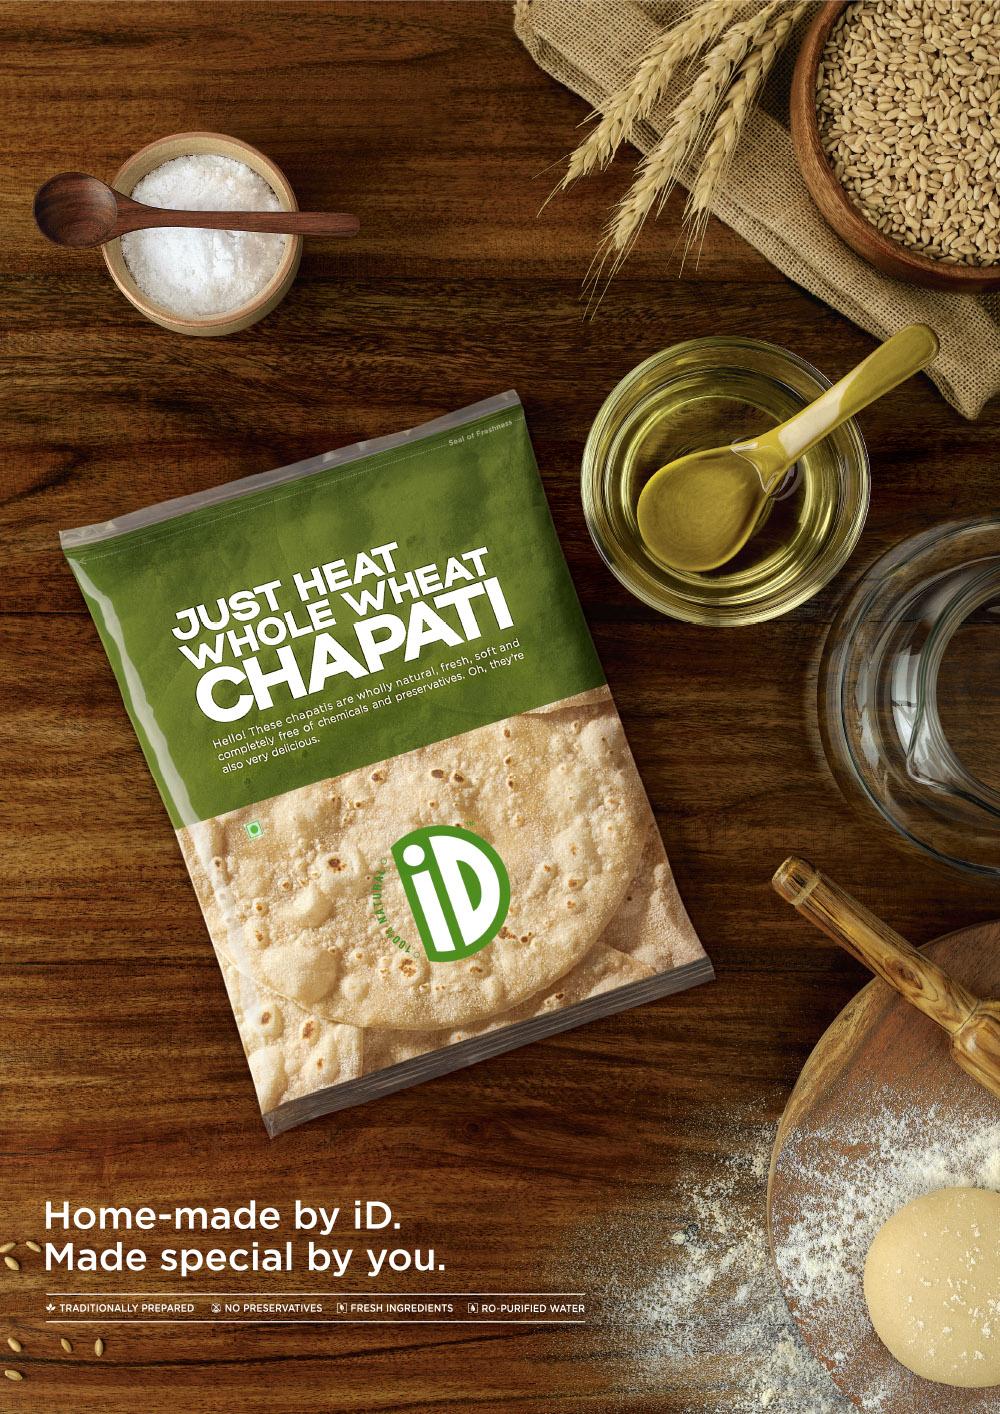 IDLaunch2015-Chapati.jpg